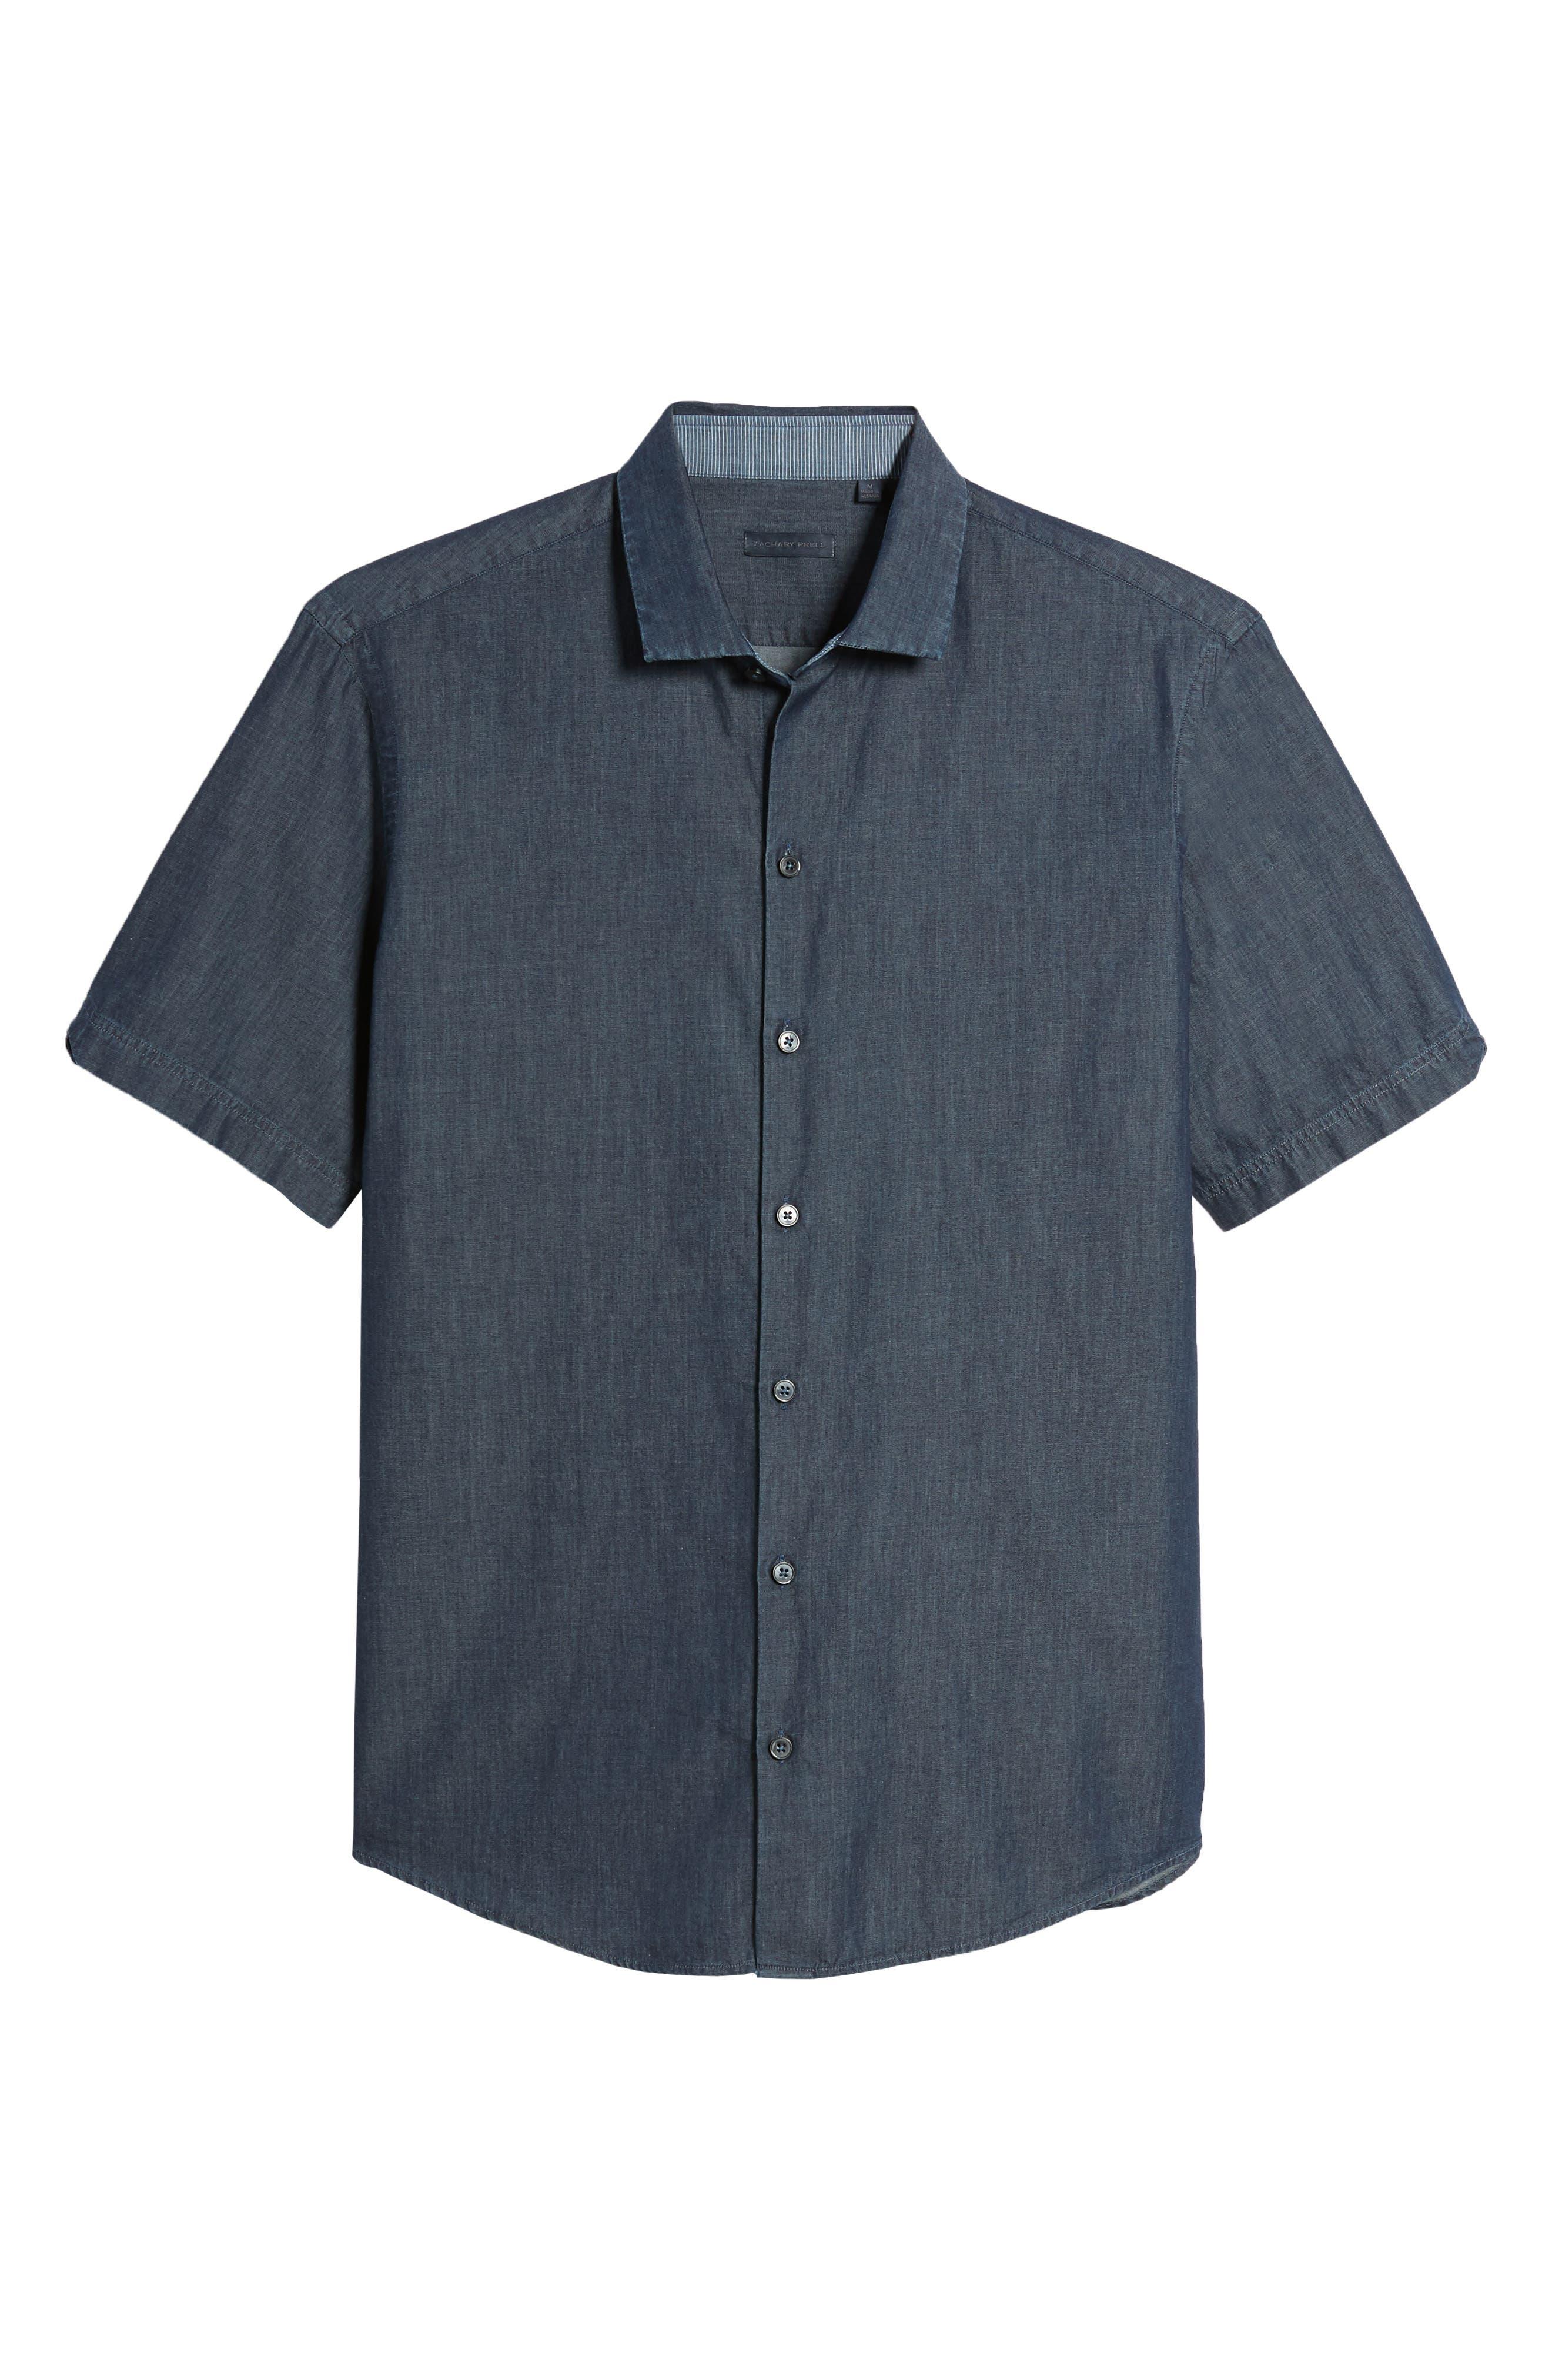 ZACHARY PRELL,                             Manolis Denim Sport Shirt,                             Alternate thumbnail 6, color,                             471